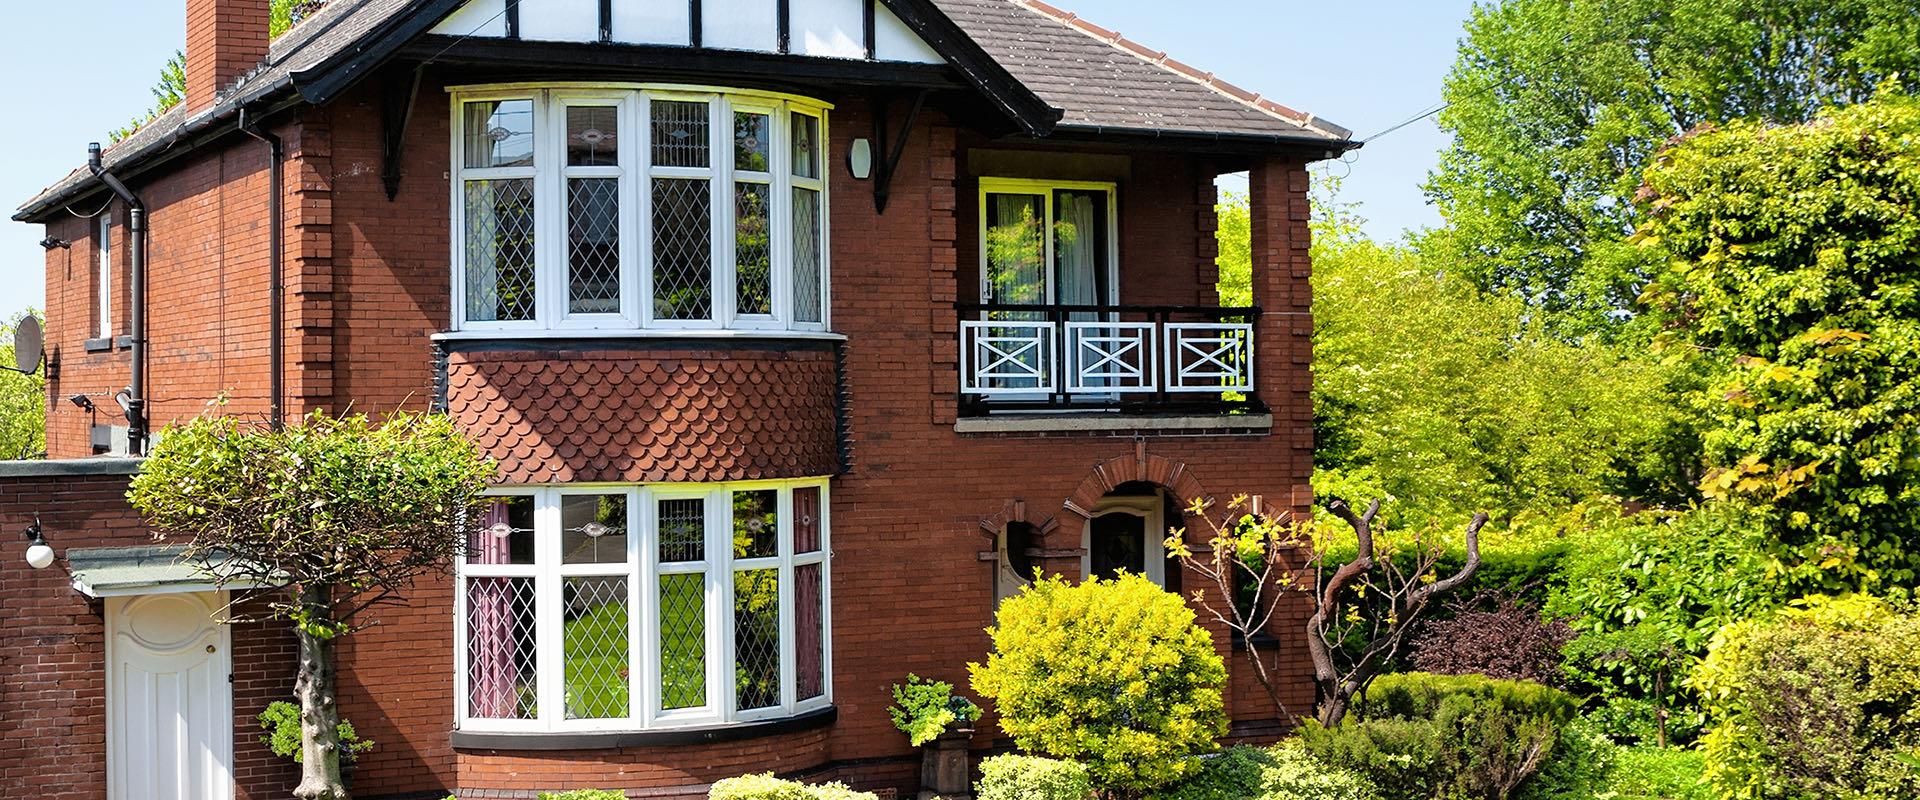 Double Glazed uPVC Windows Colchester Essex